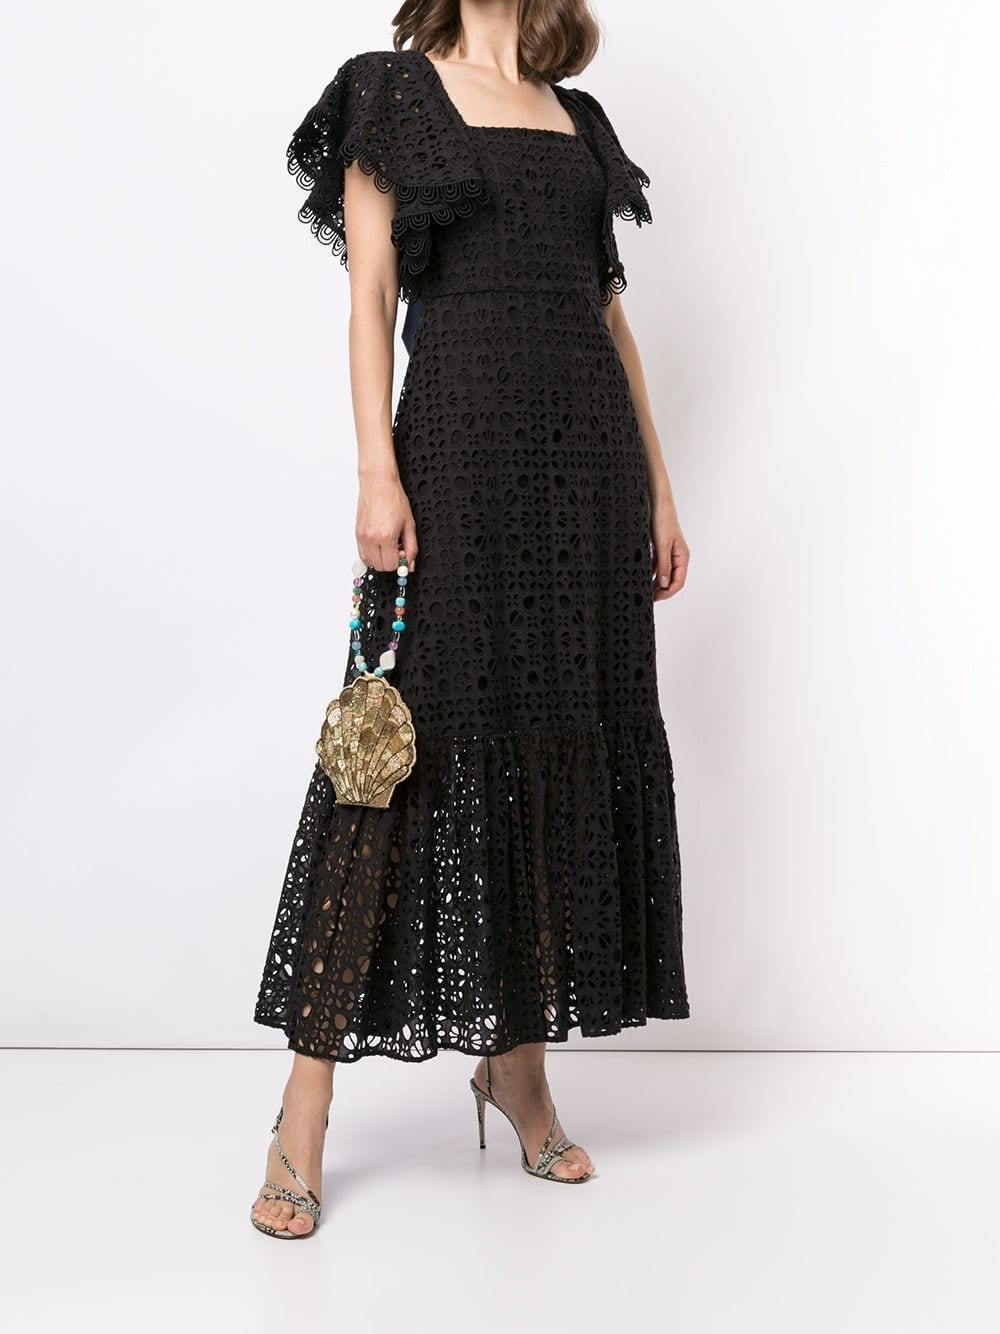 SACHIN & BABI Camryn Broderie Anglais Own Dress